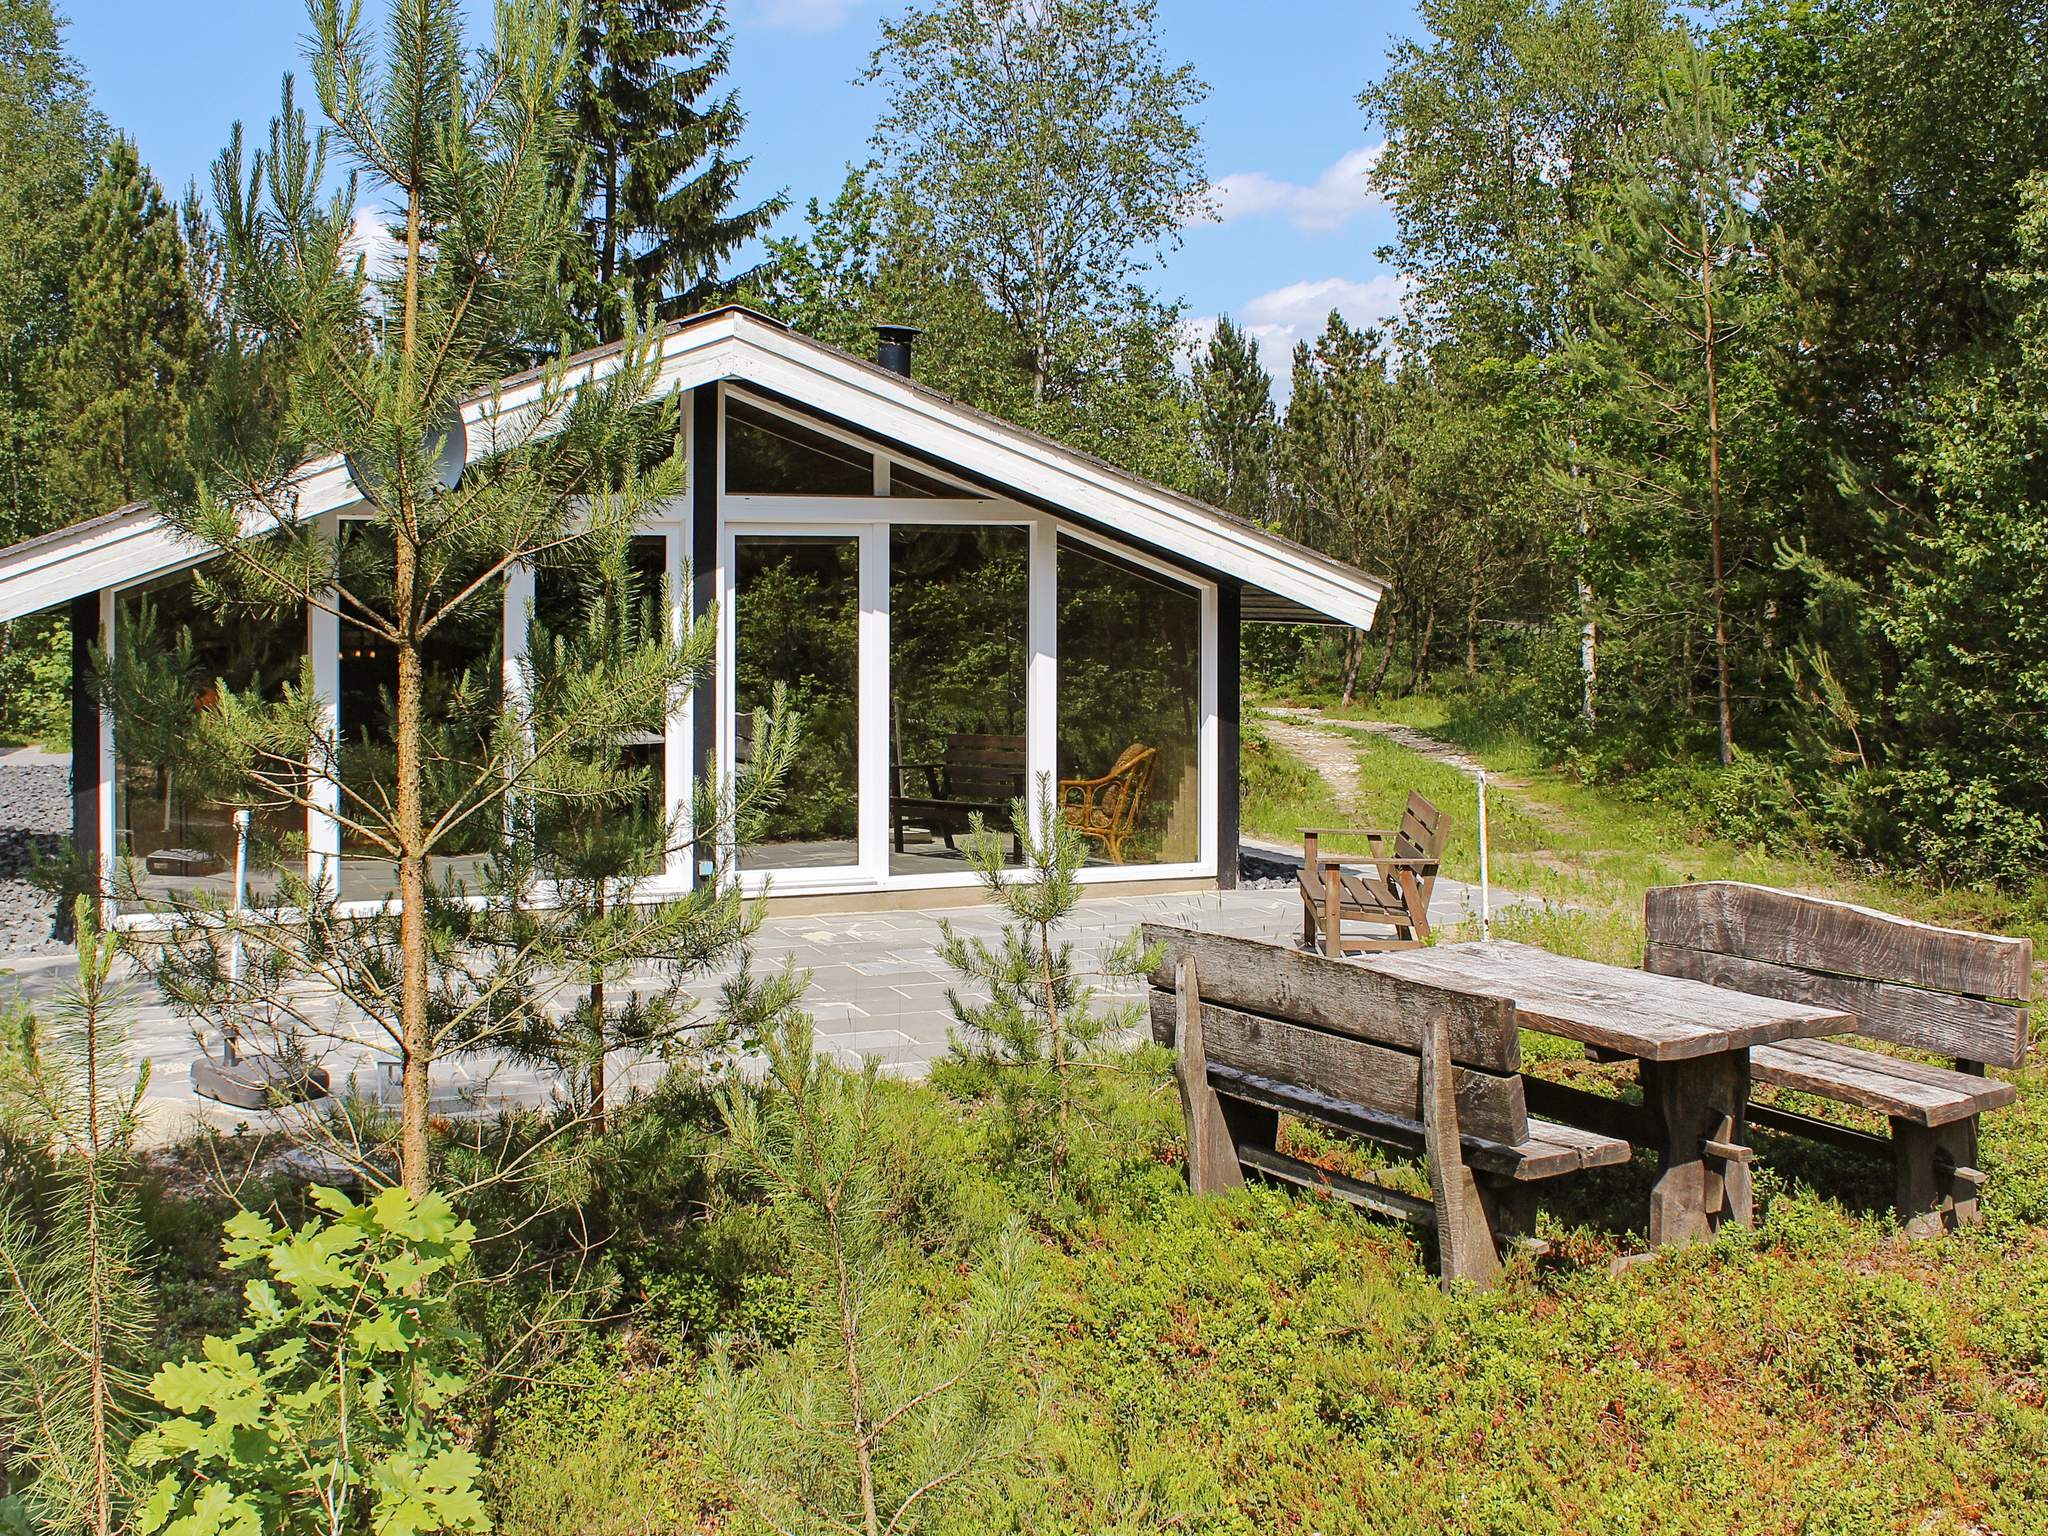 Ferienhaus Kølkær (377905), Kølkær, , Westjütland, Dänemark, Bild 1